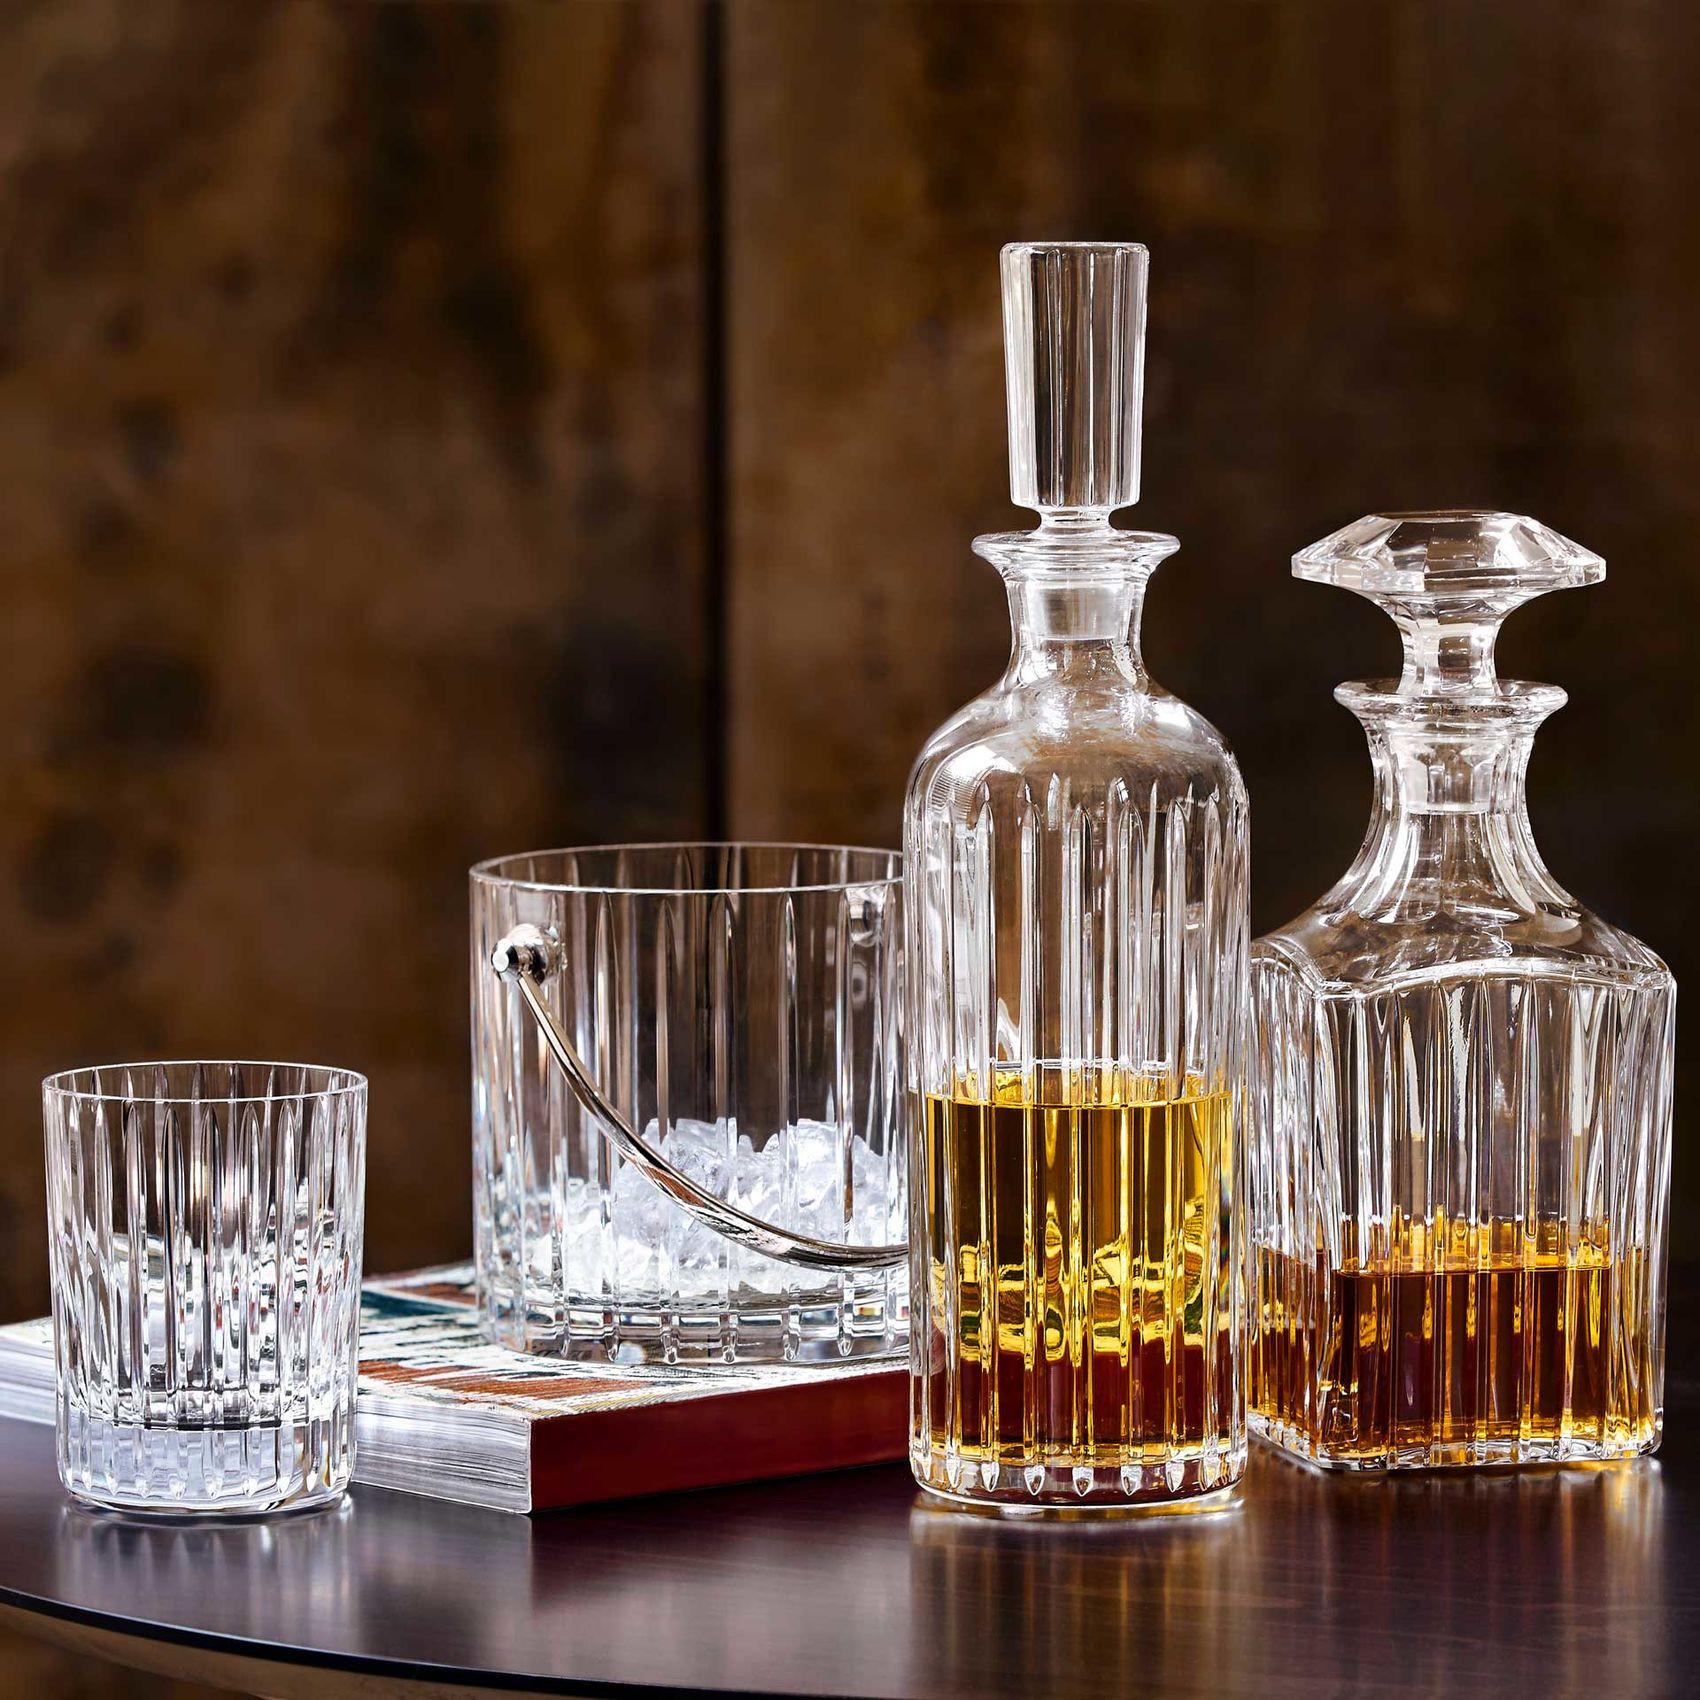 10 Fashionable Baccarat Harmonie Vase 2021 free download baccarat harmonie vase of harmonie whiskey decanter square baccarat within harmonie whiskey decanter square